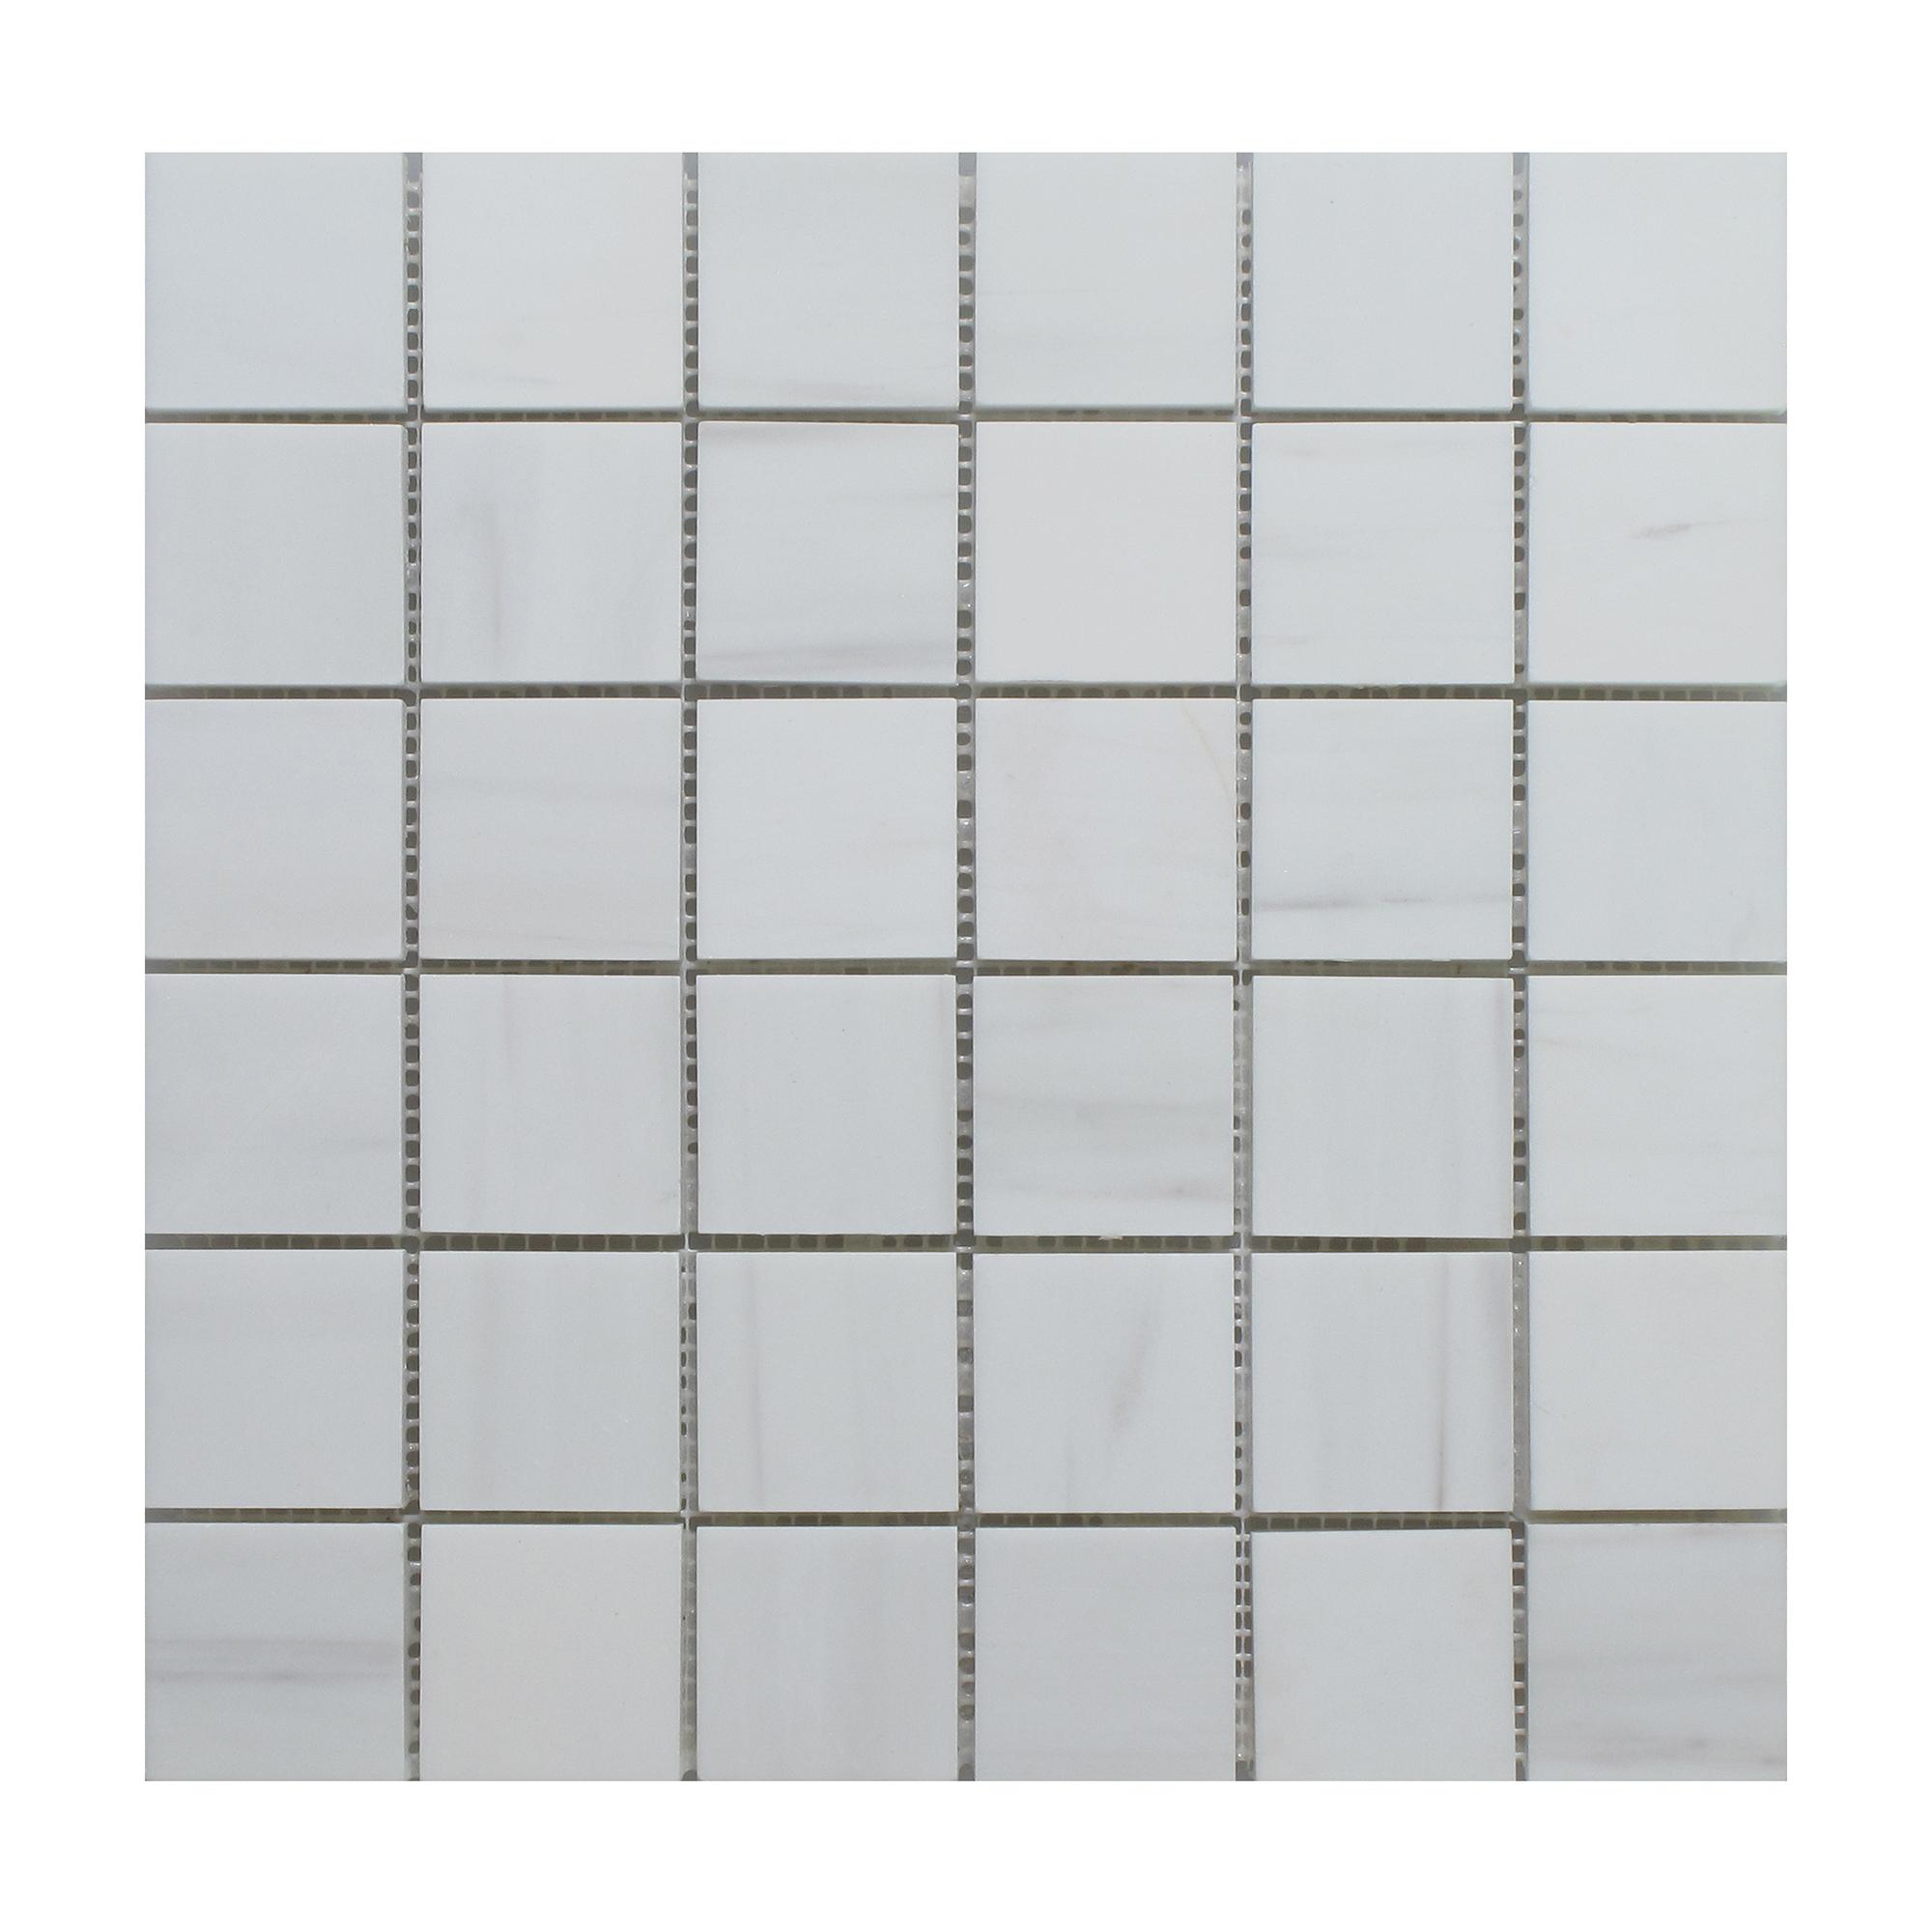 Dolomite Square - 2x2 Image